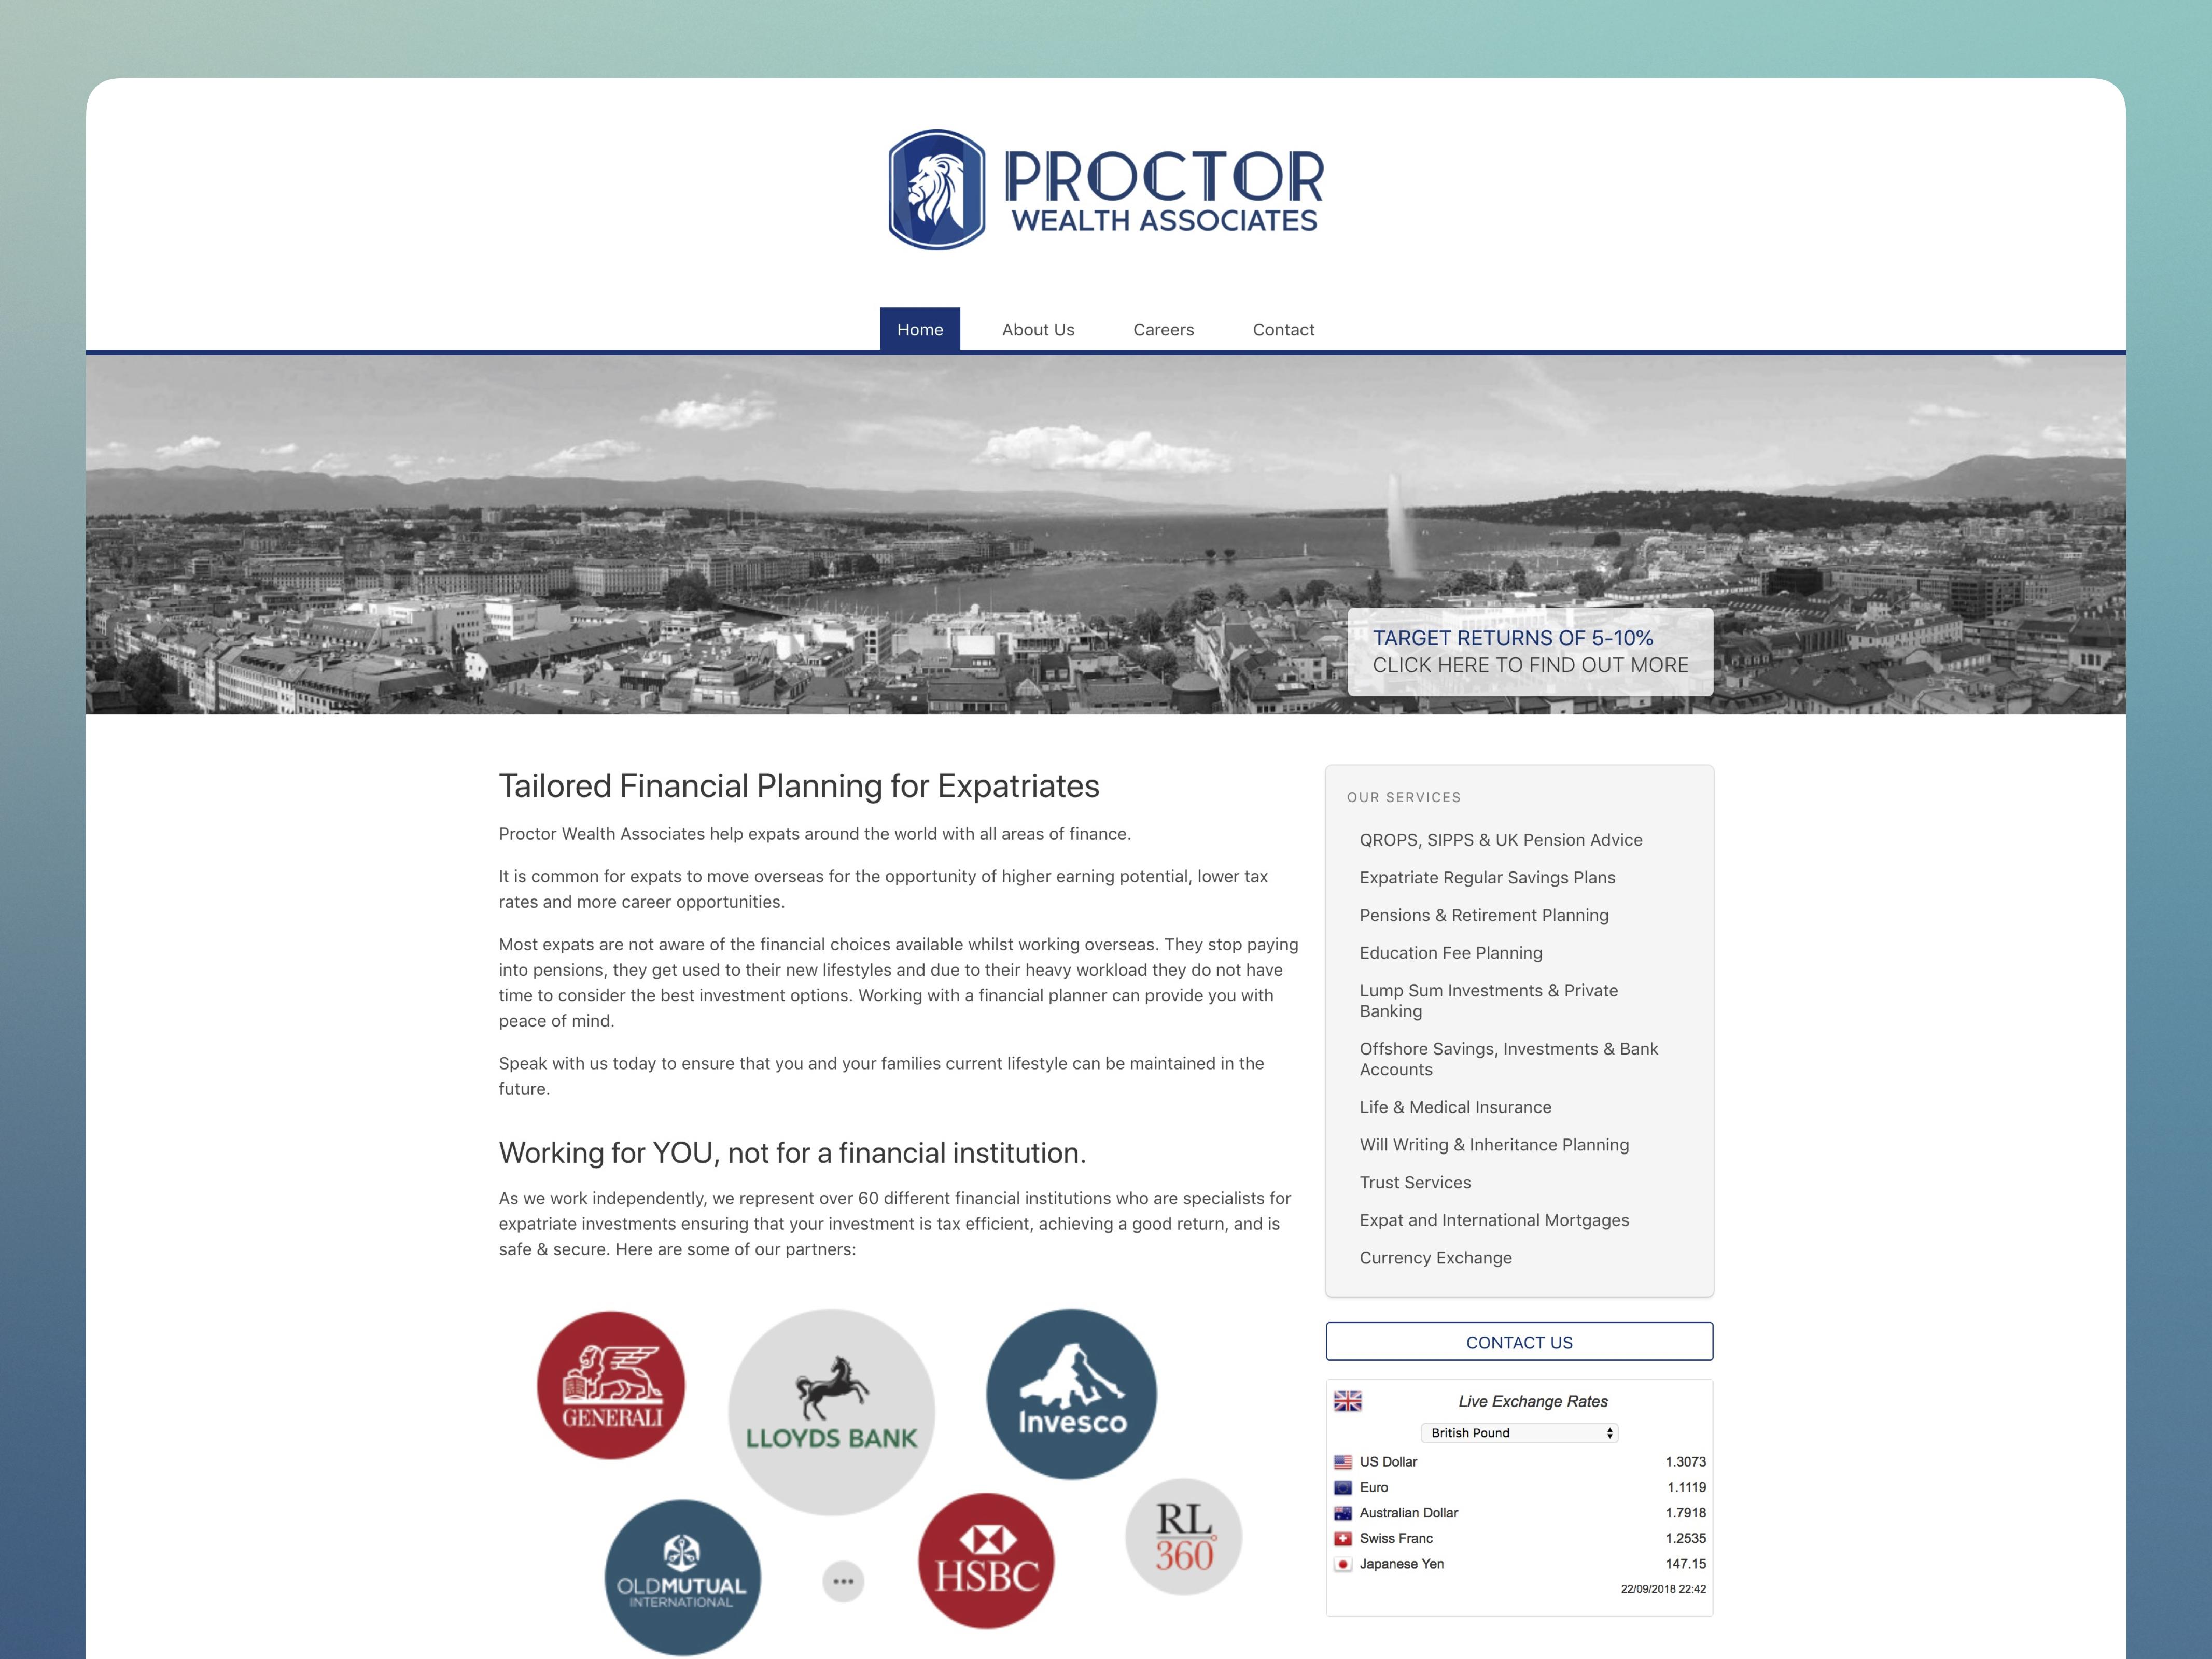 Proctor Wealth Associates